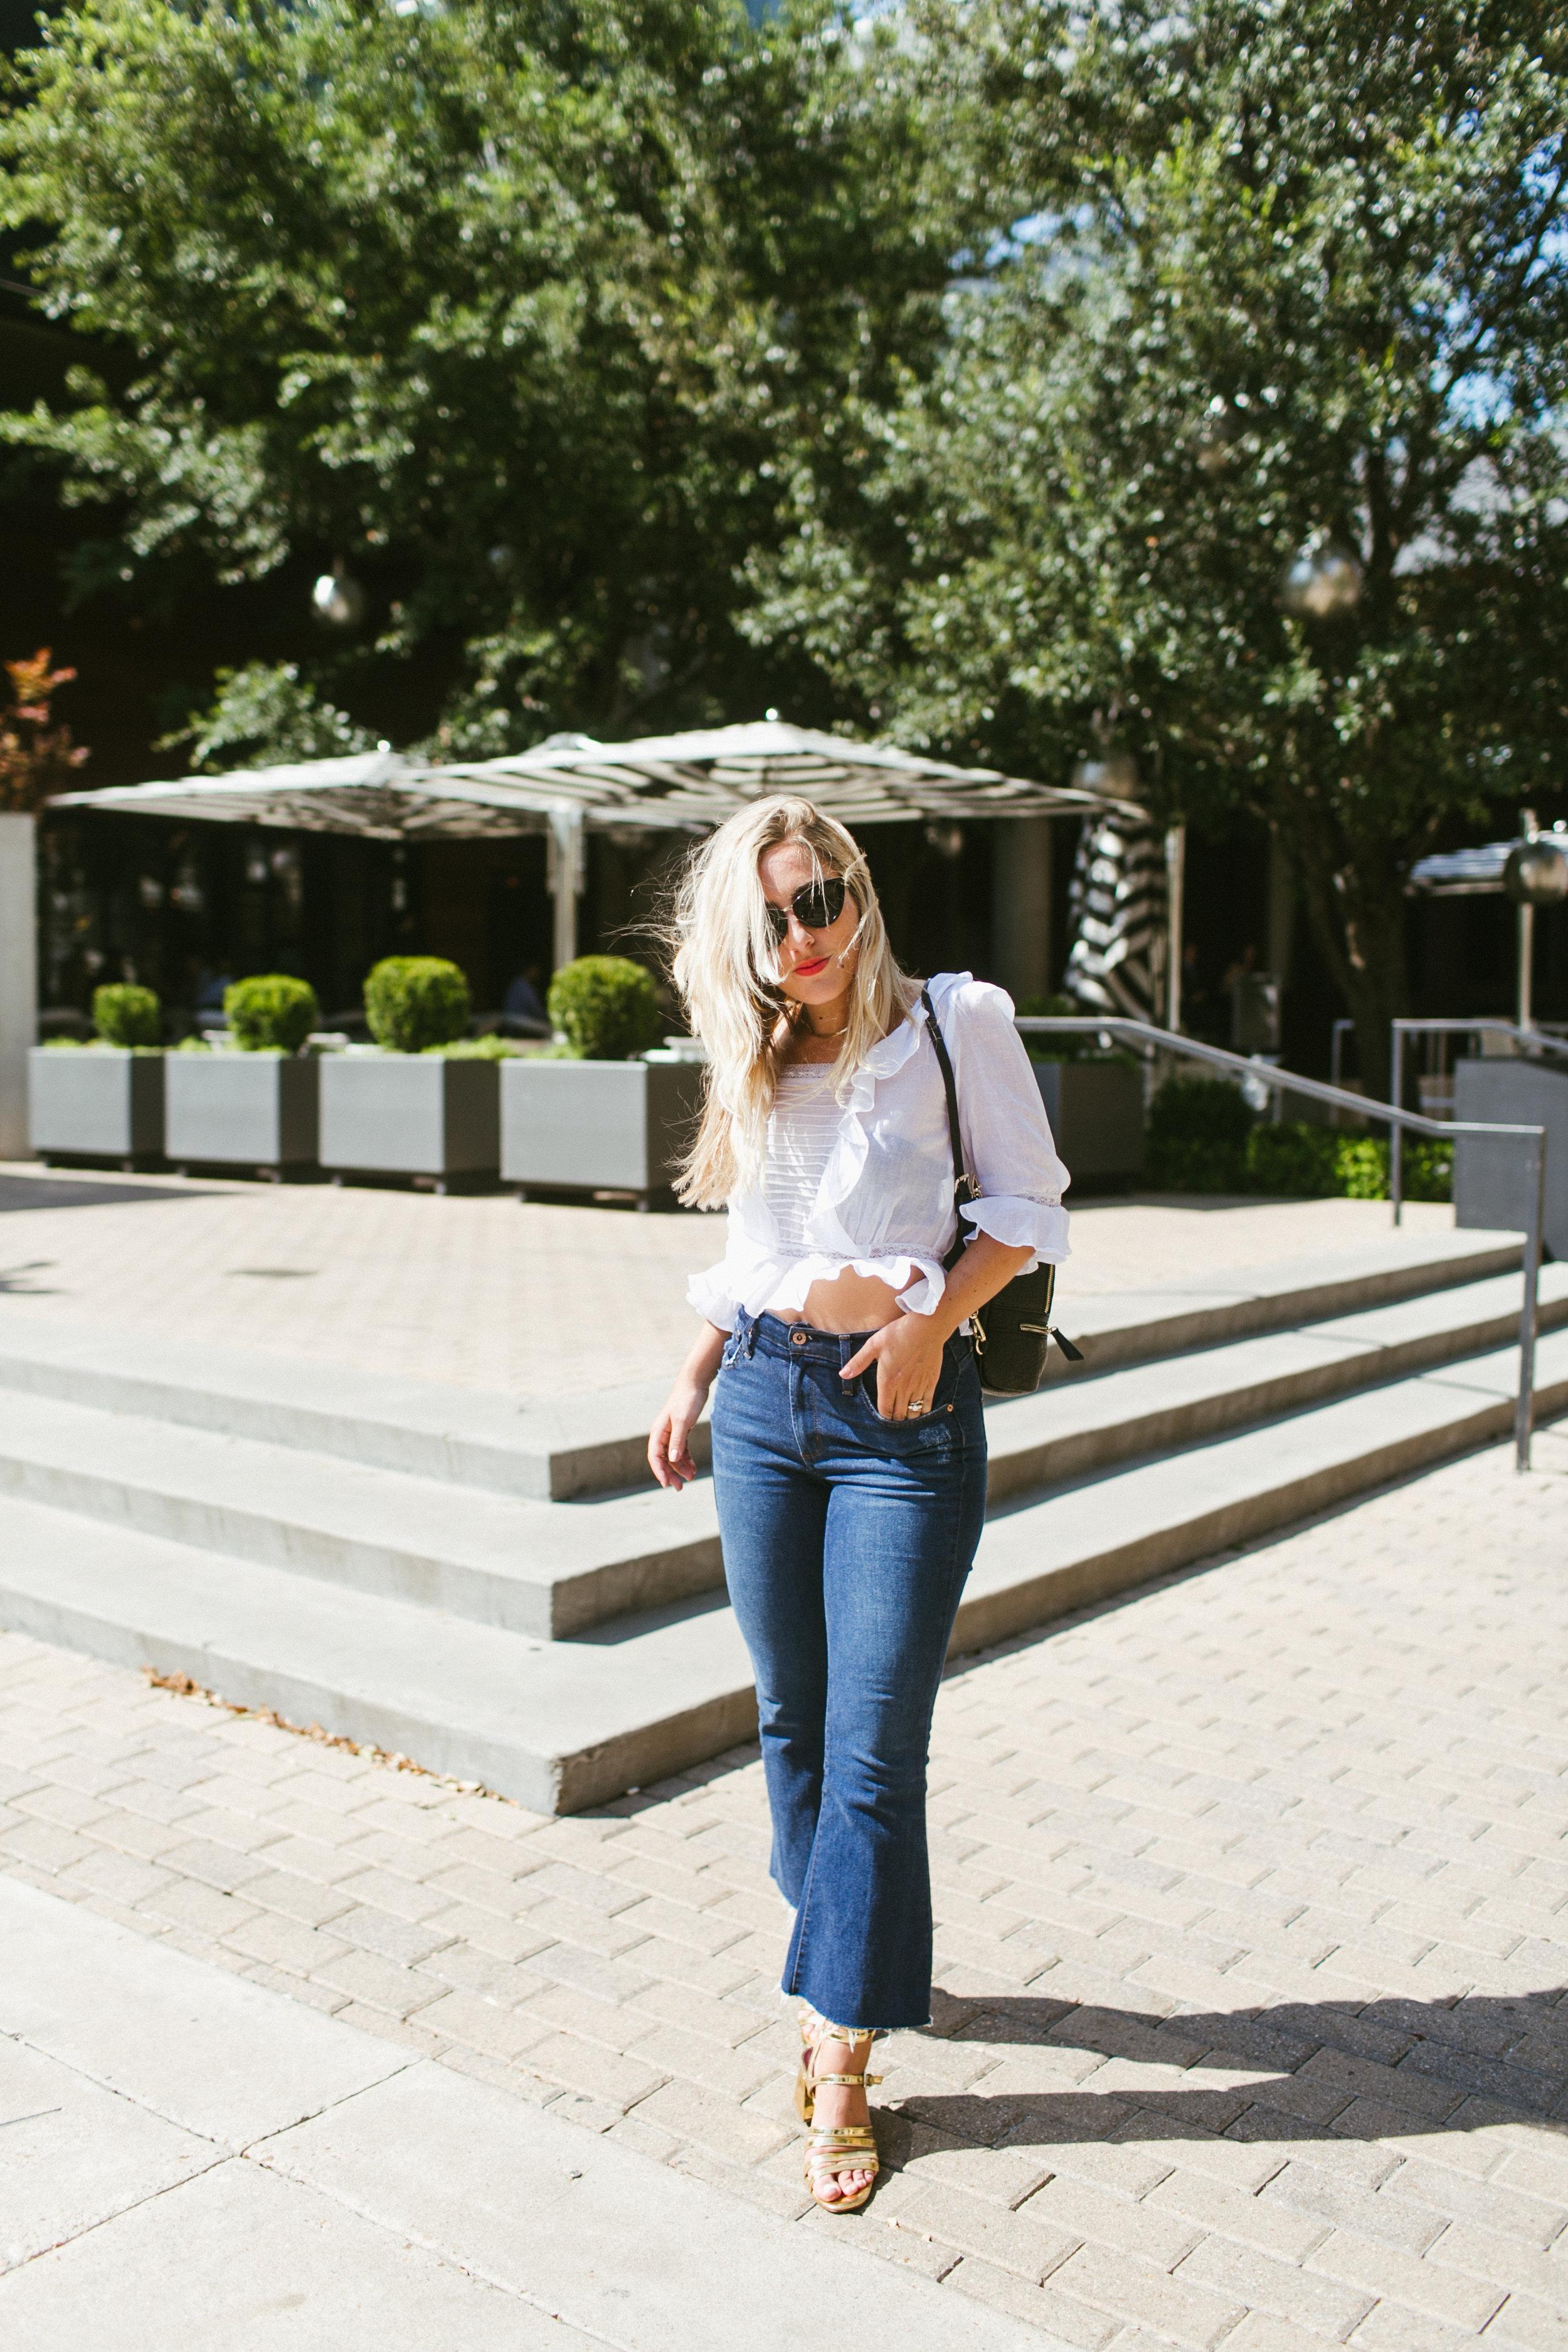 Paige-Newton-Austin-Blogger-Photography-Fashion0013.jpg